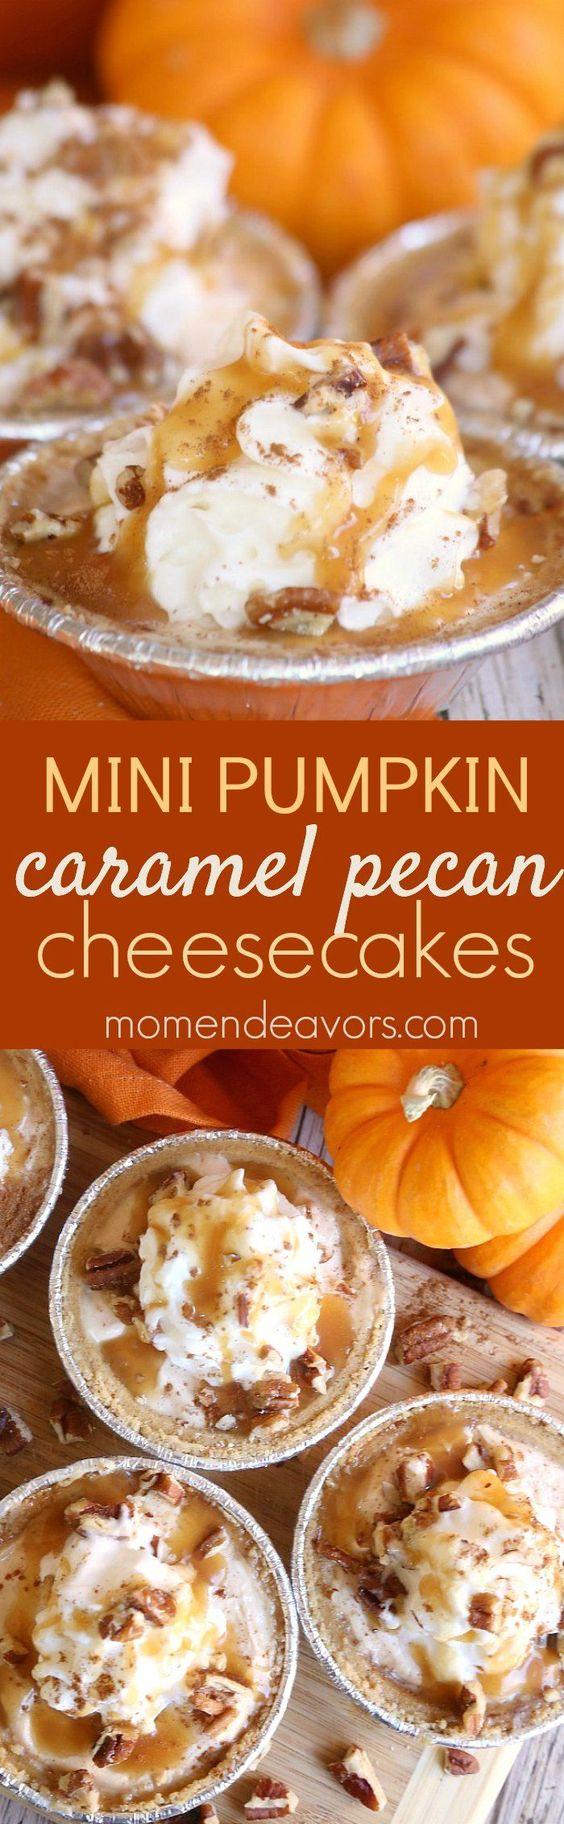 Mini Pumpkin Caramel Pecan No Bake Cheesecakes Recipe